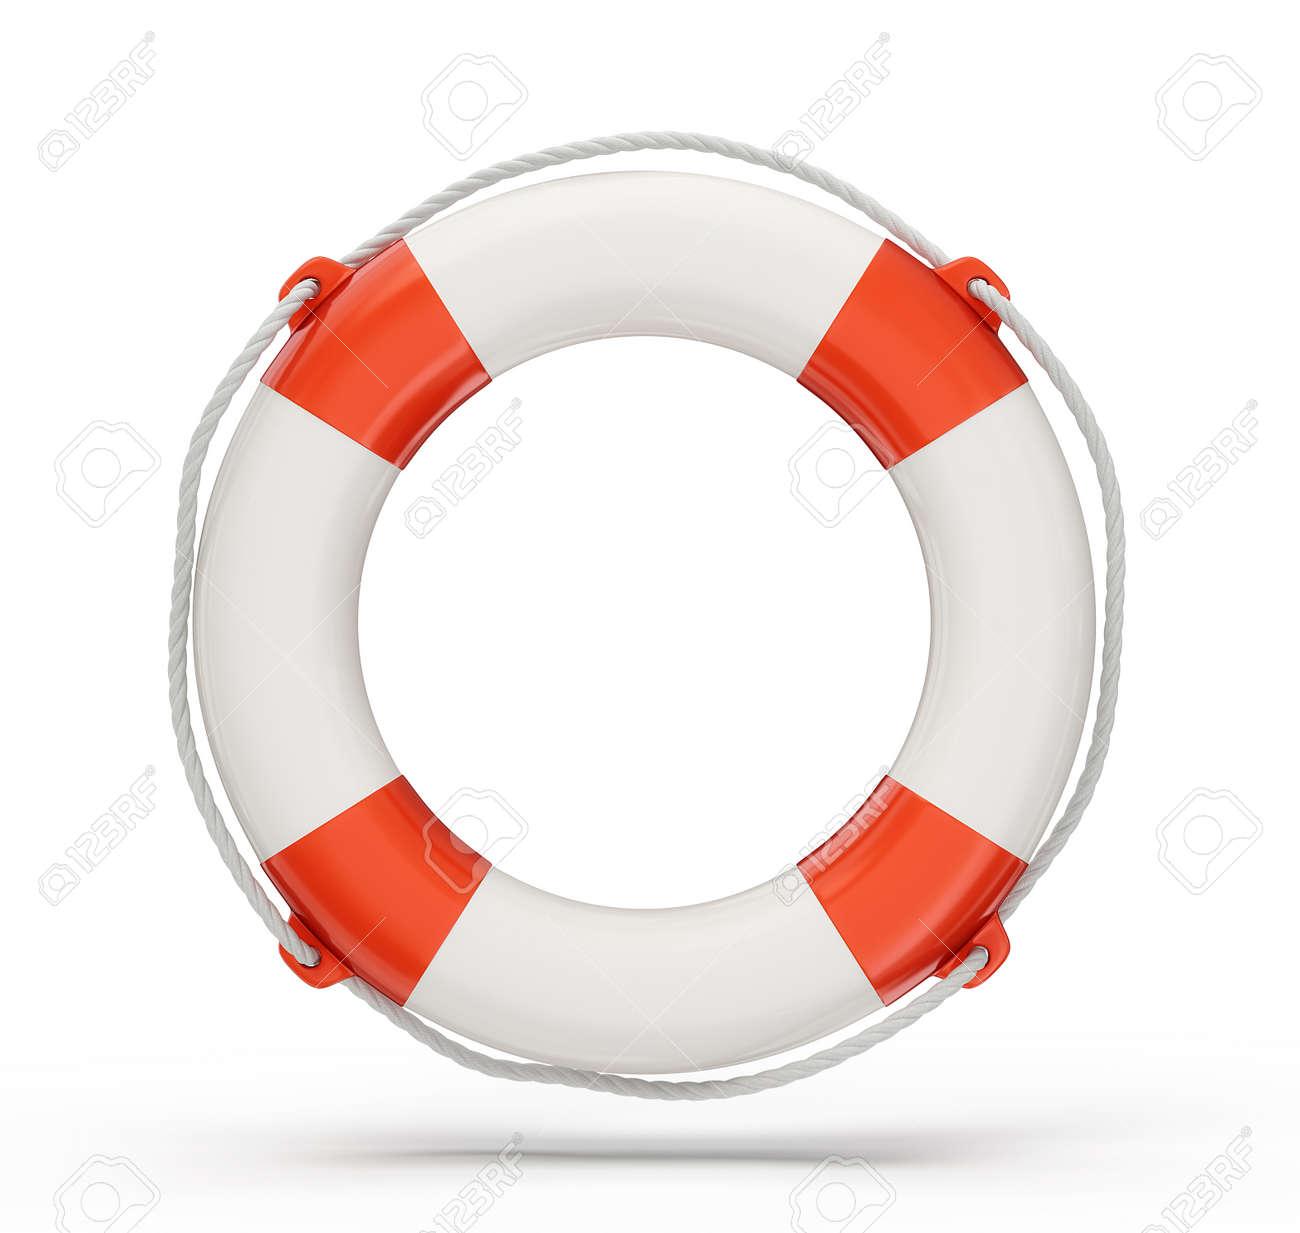 lifebuoy isolated on a white background. 3d illustration - 25742147